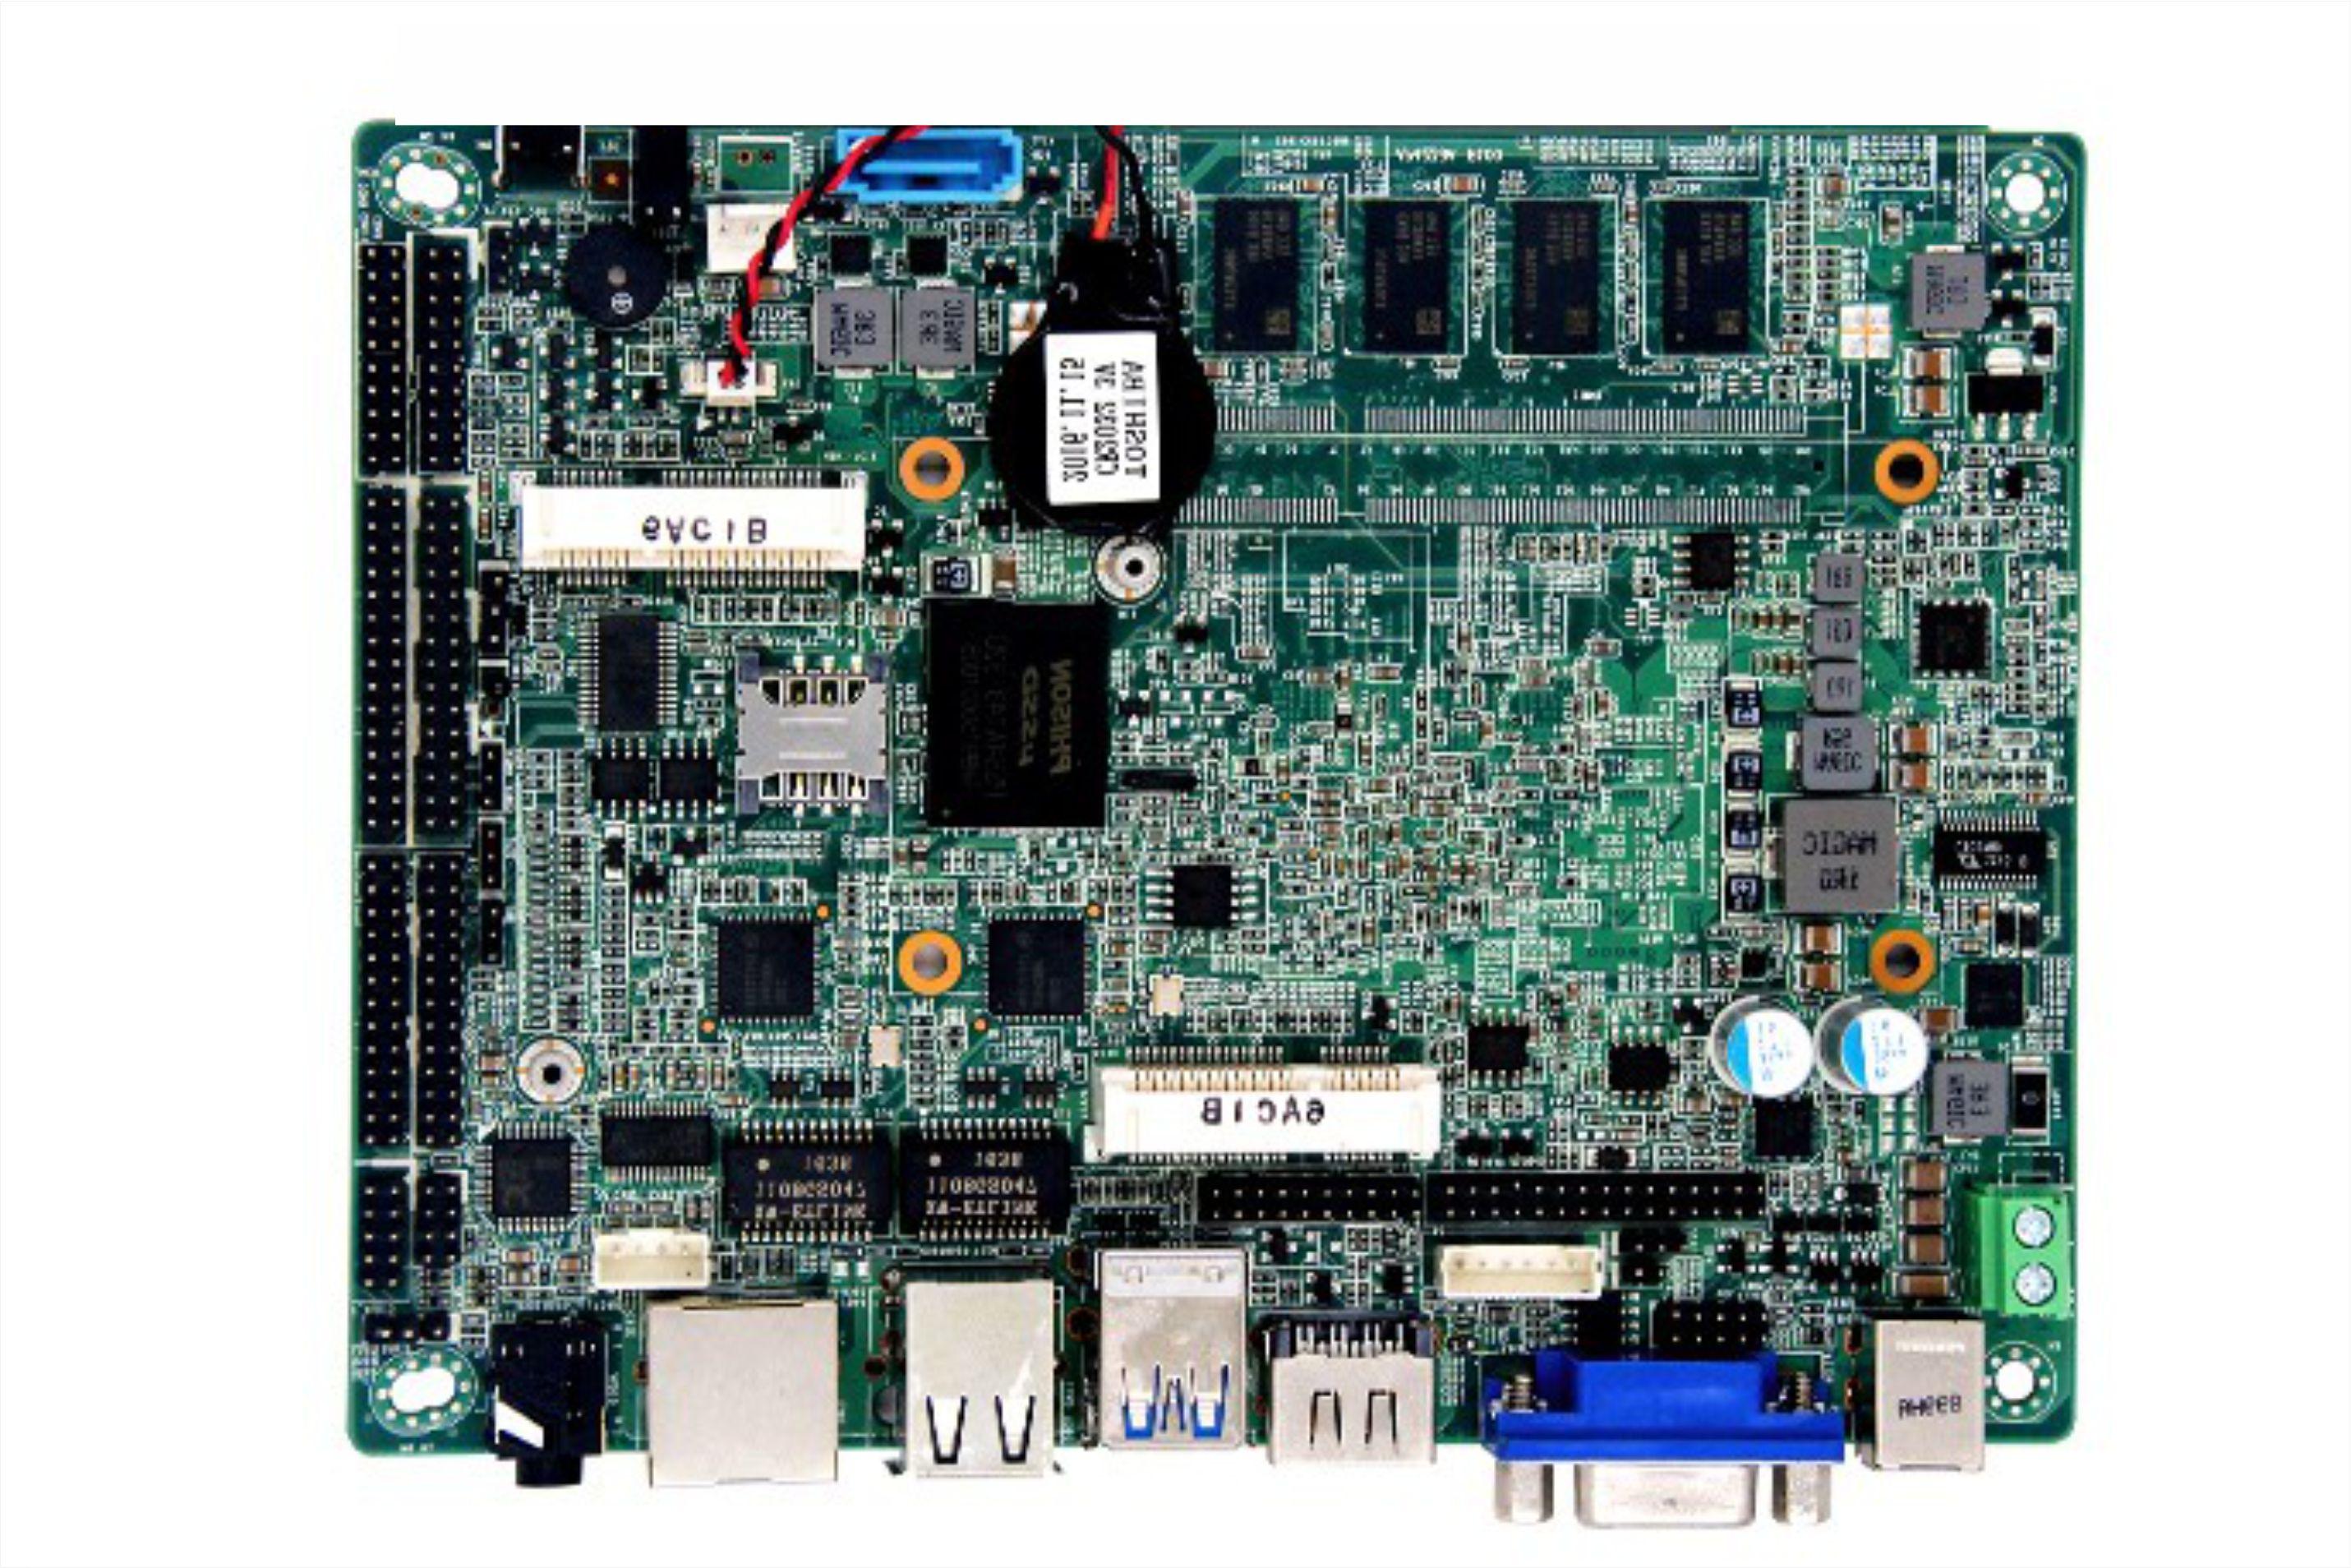 Apollo lake系列处理器嵌入式工业主板背面散热